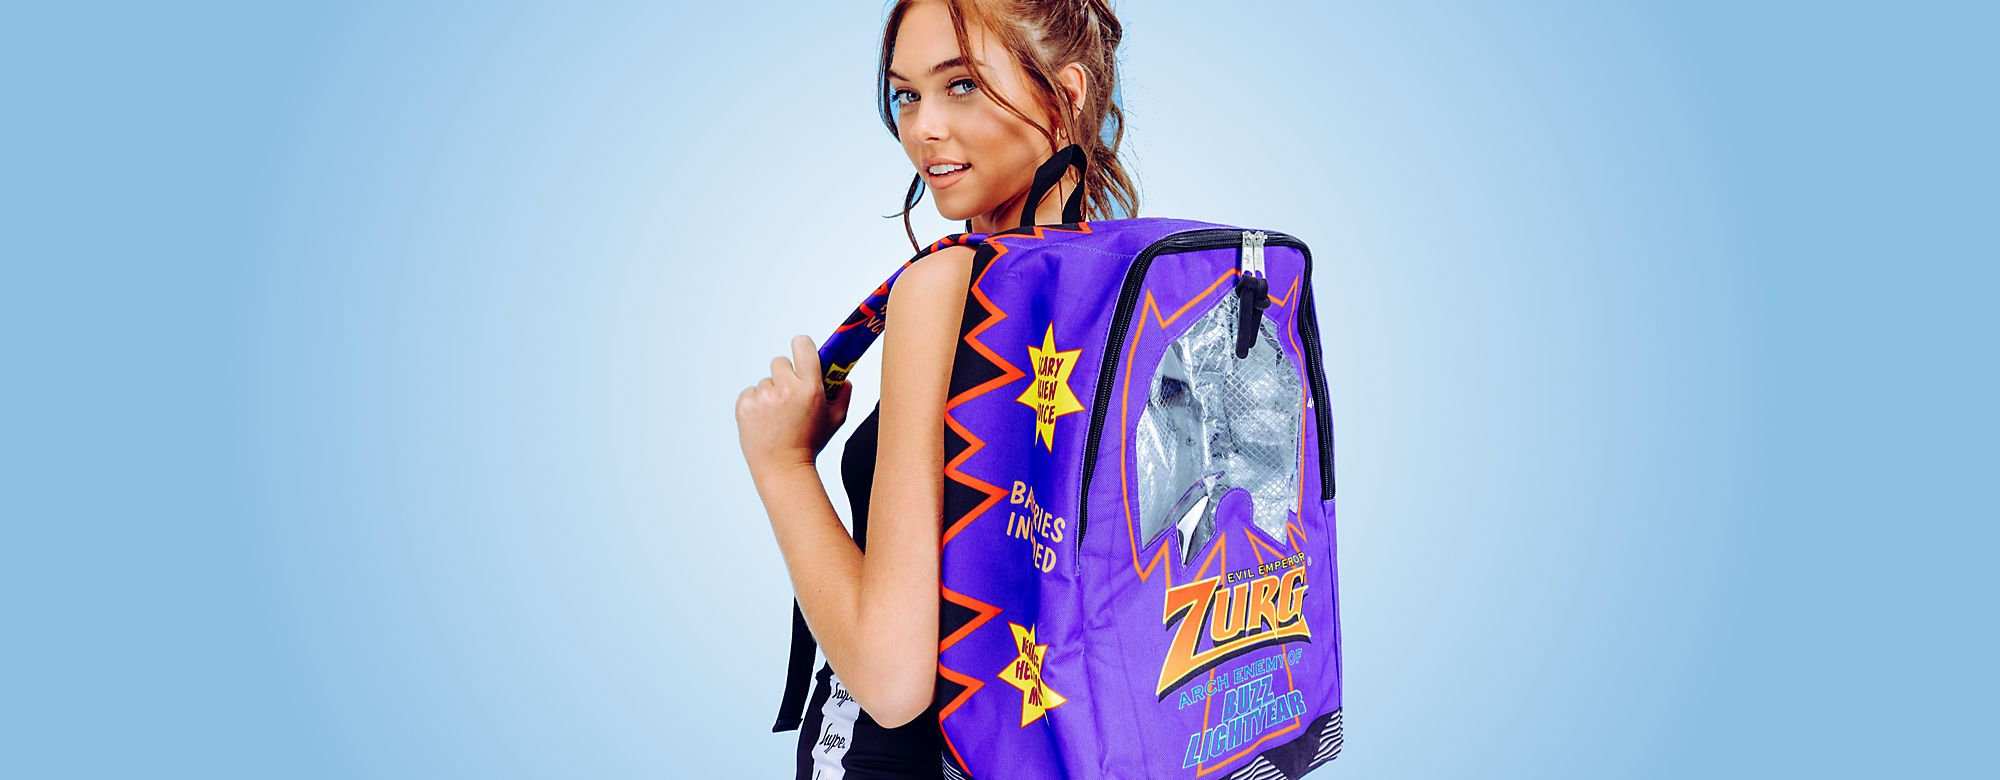 62ba20b55 Hype for Disney - Bags, Hats & Pencil Cases | shopDisney